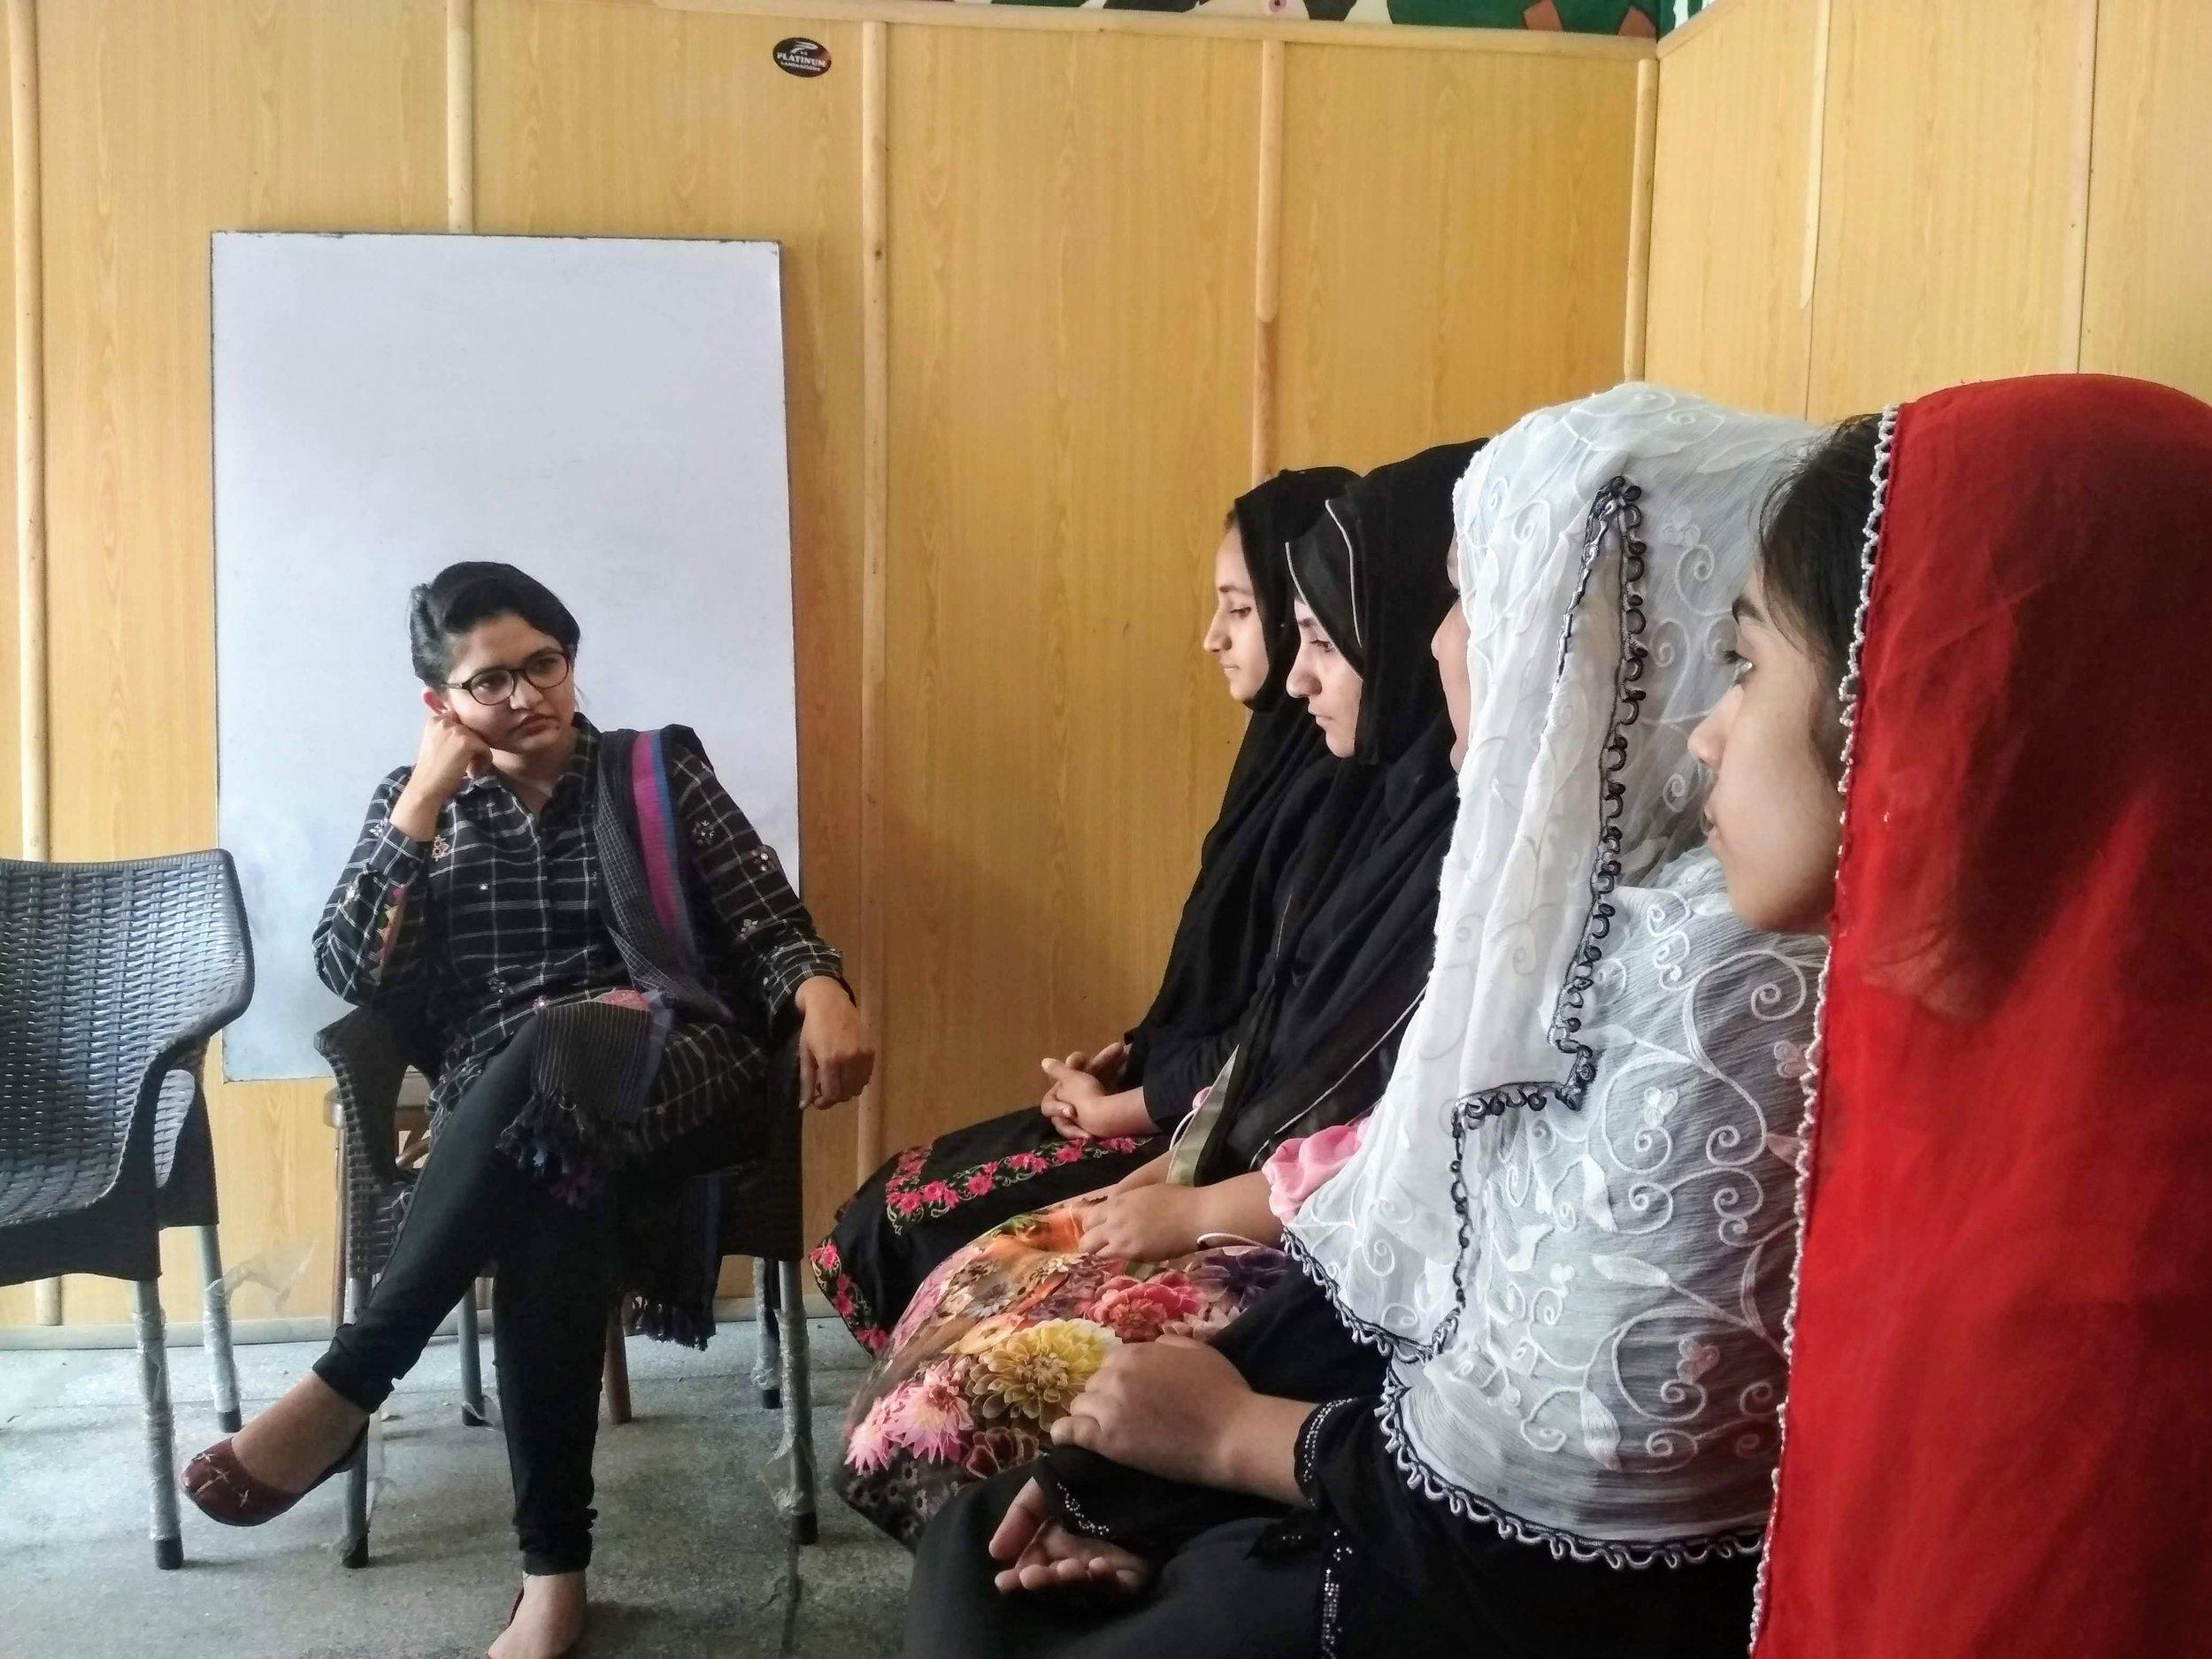 Fatima Rizwan visits Autome.me